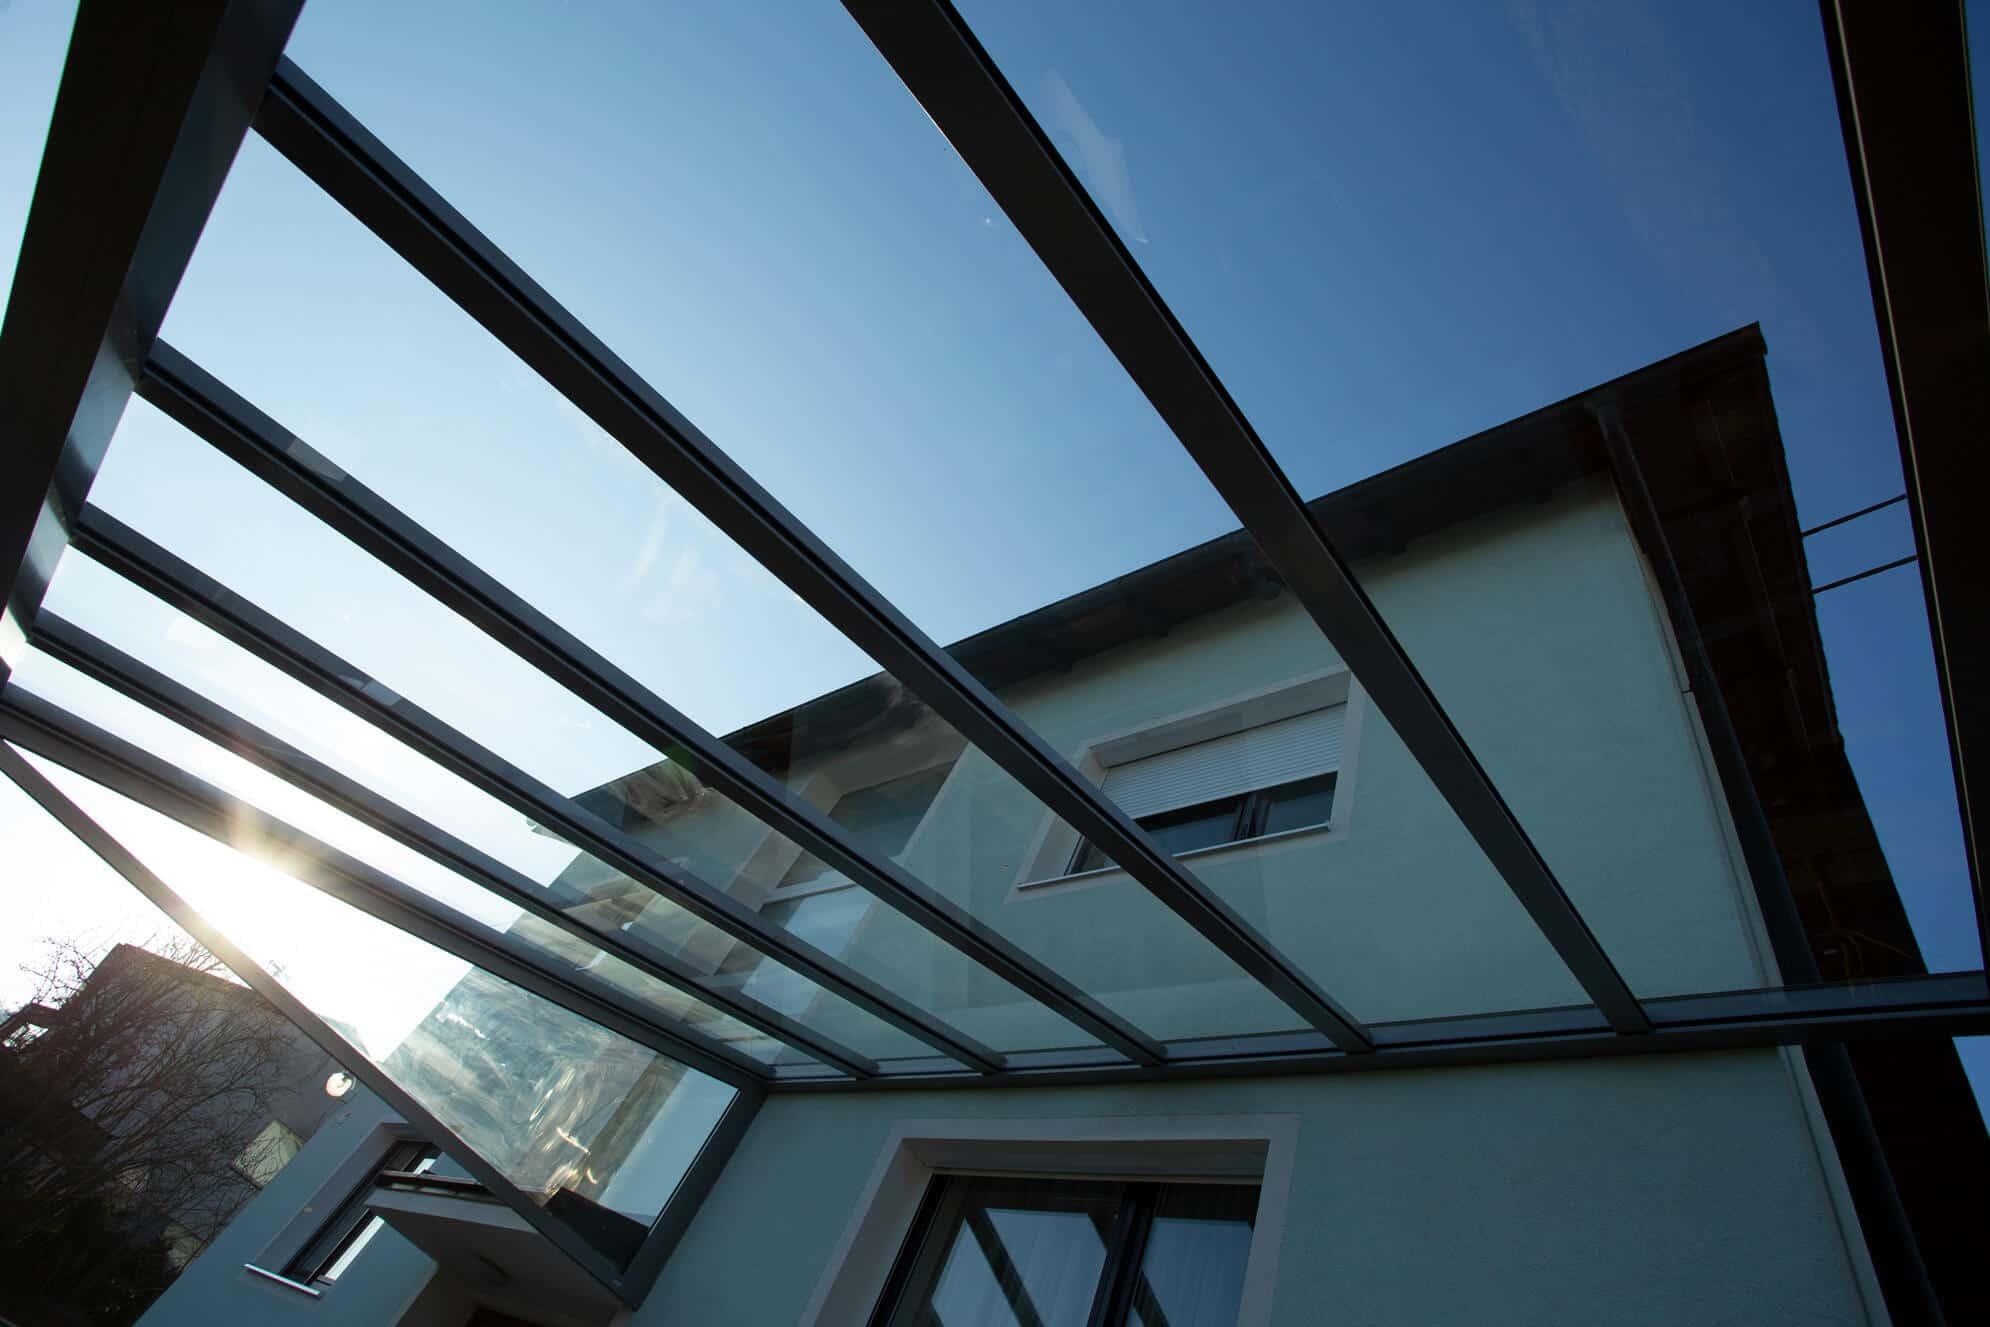 Terrassenüberdachung Pultdachkonstruktion